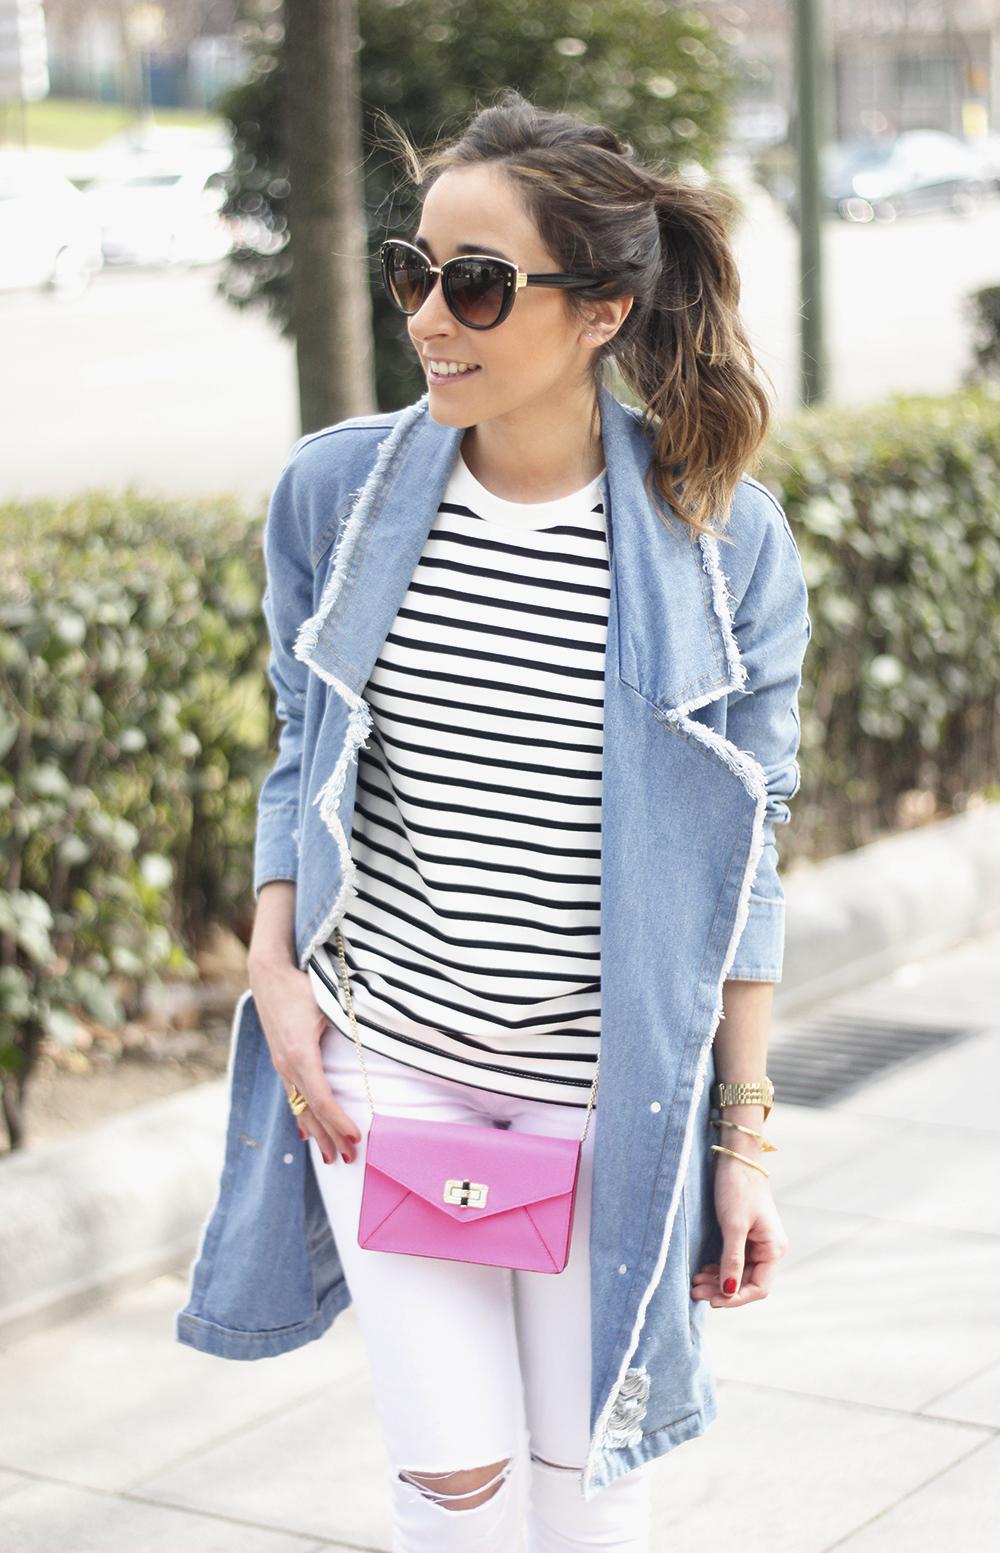 Stripes and Denim Coat Gloria Ortiz Heels Accessories Sunnies Outfit03